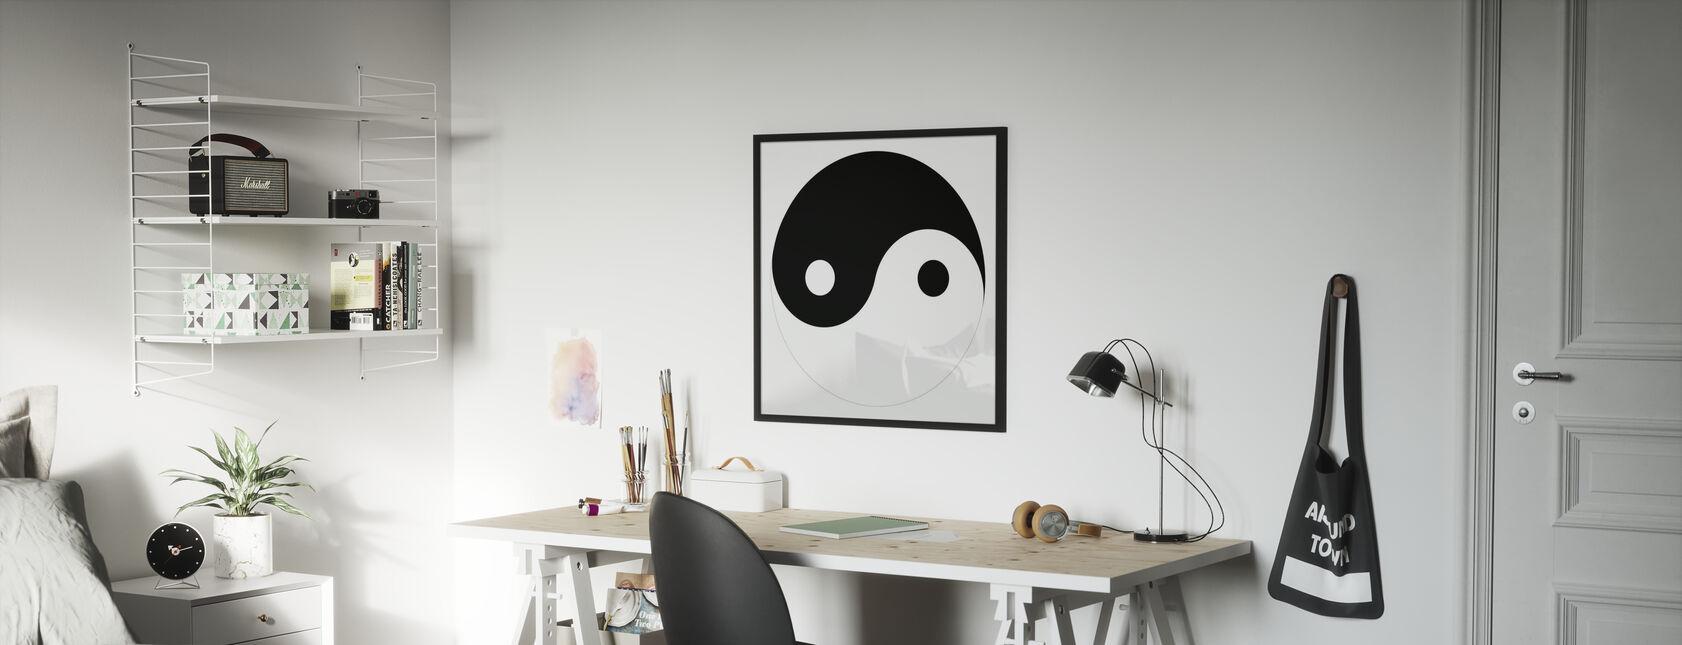 Yin-Yang - Poster - Kids Room